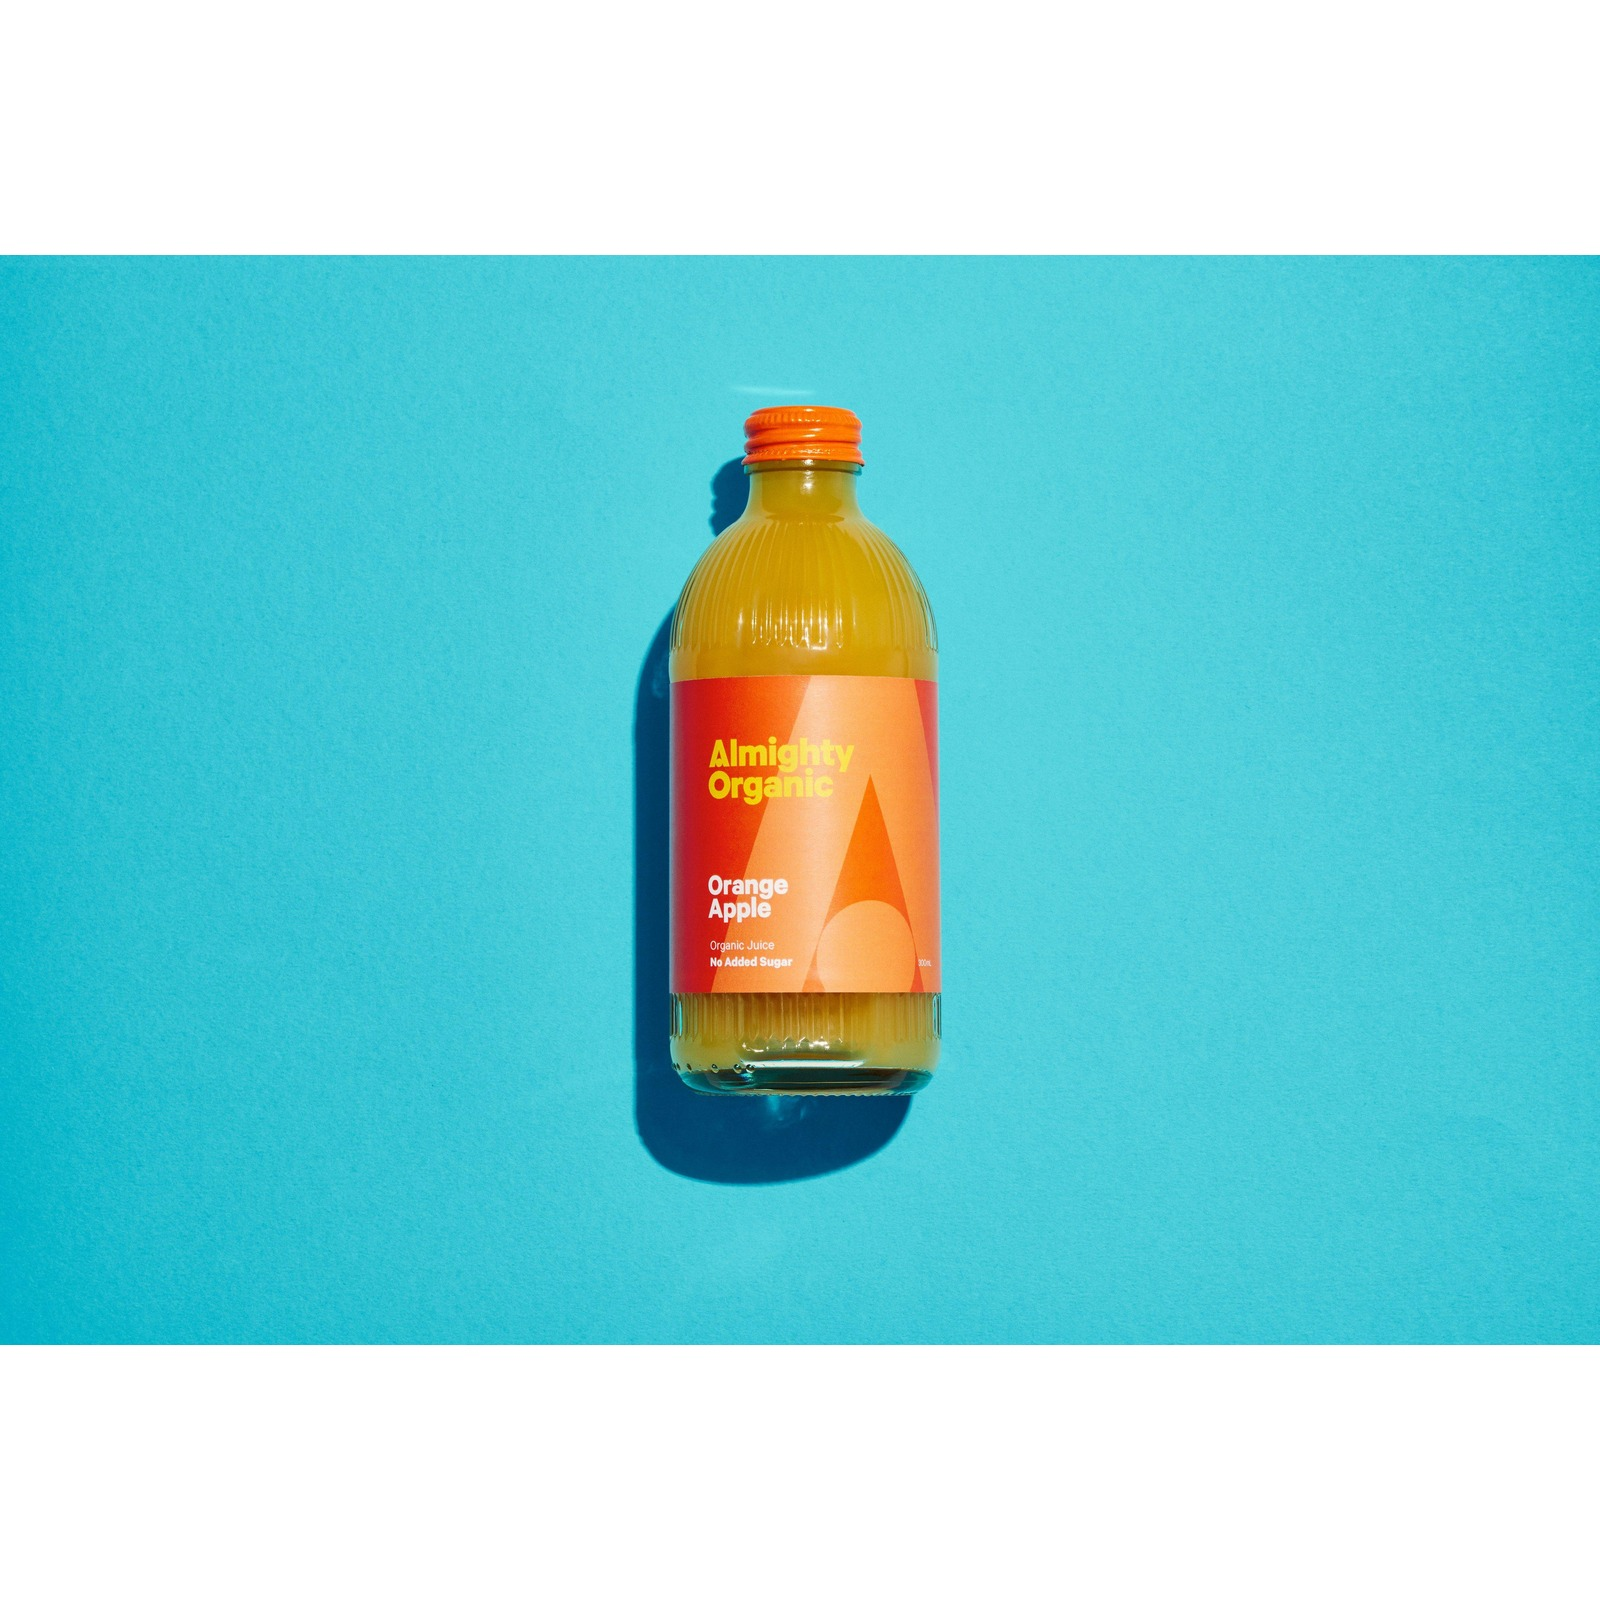 Drink Almighty Organic Juice - Orange Apple 300ML X12